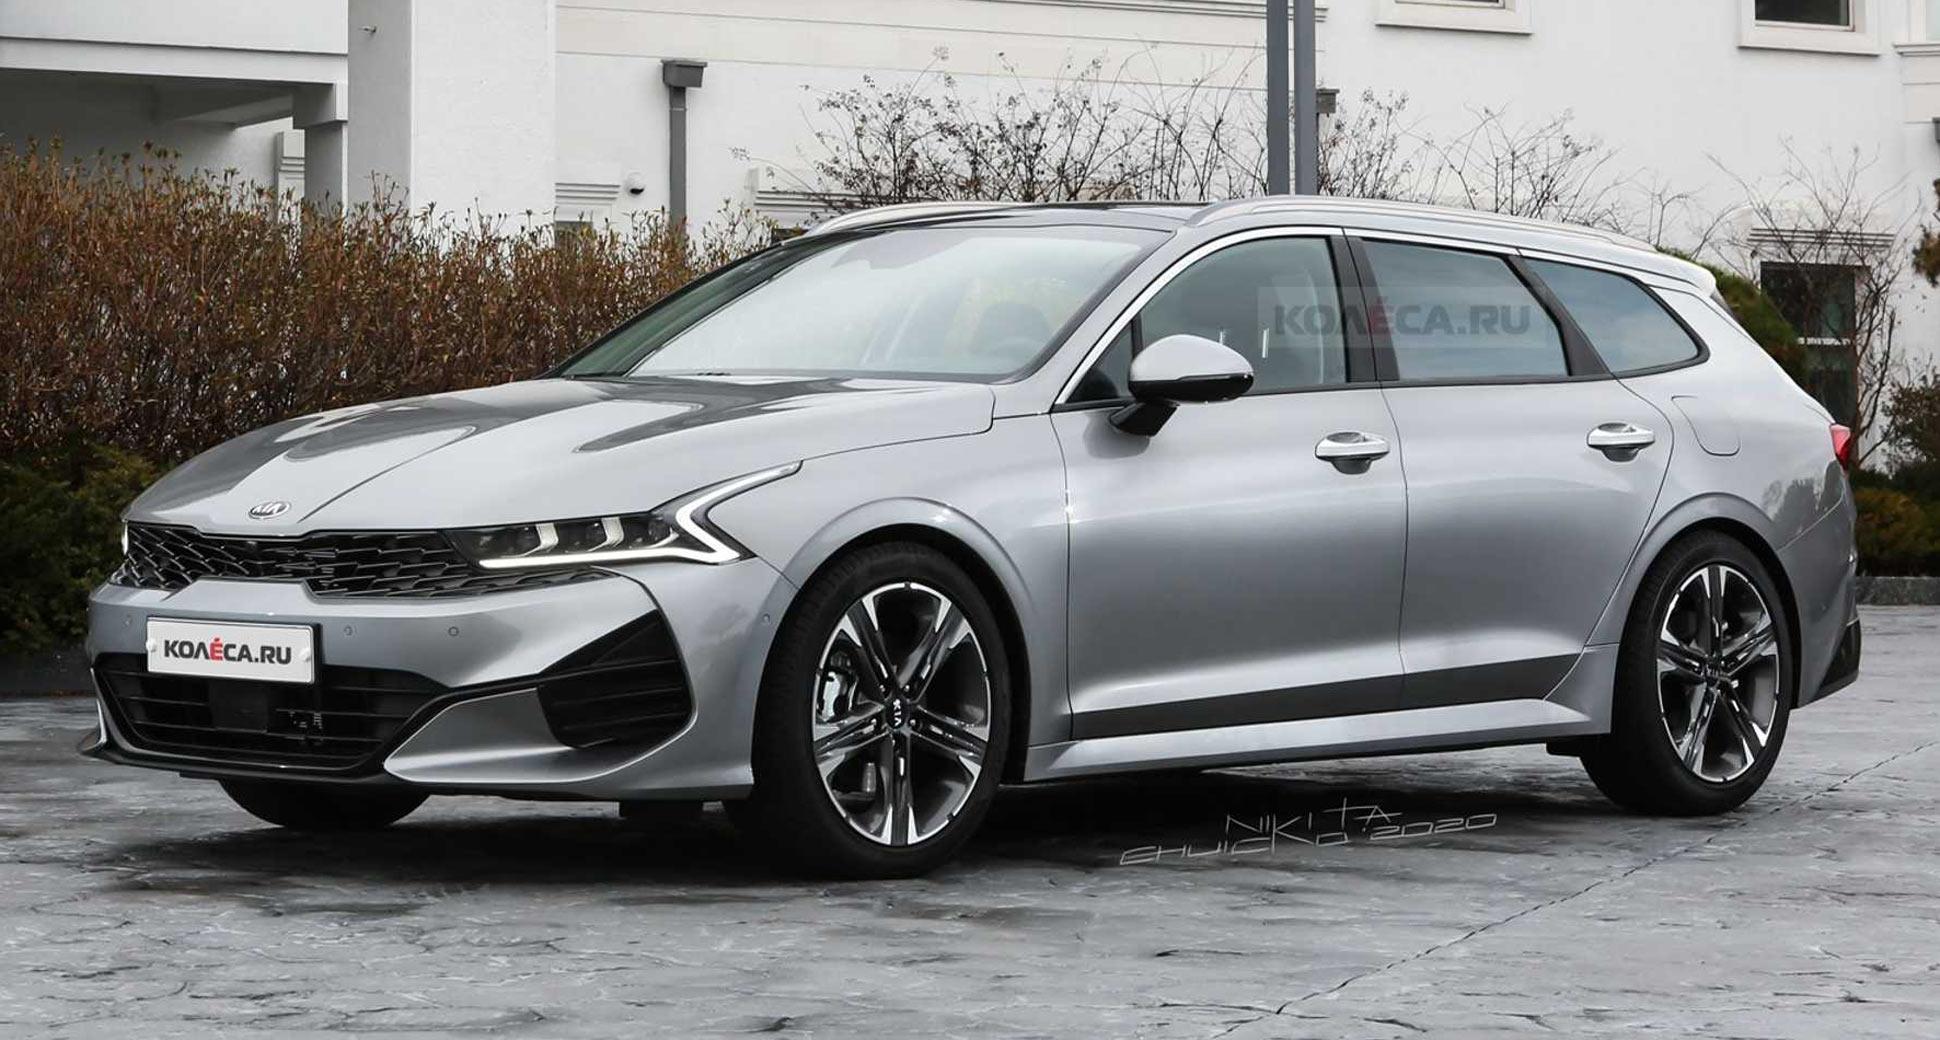 new 2021 kia optima k5 looks seductive as a sports wagon carscoops 2021 kia optima k5 looks seductive